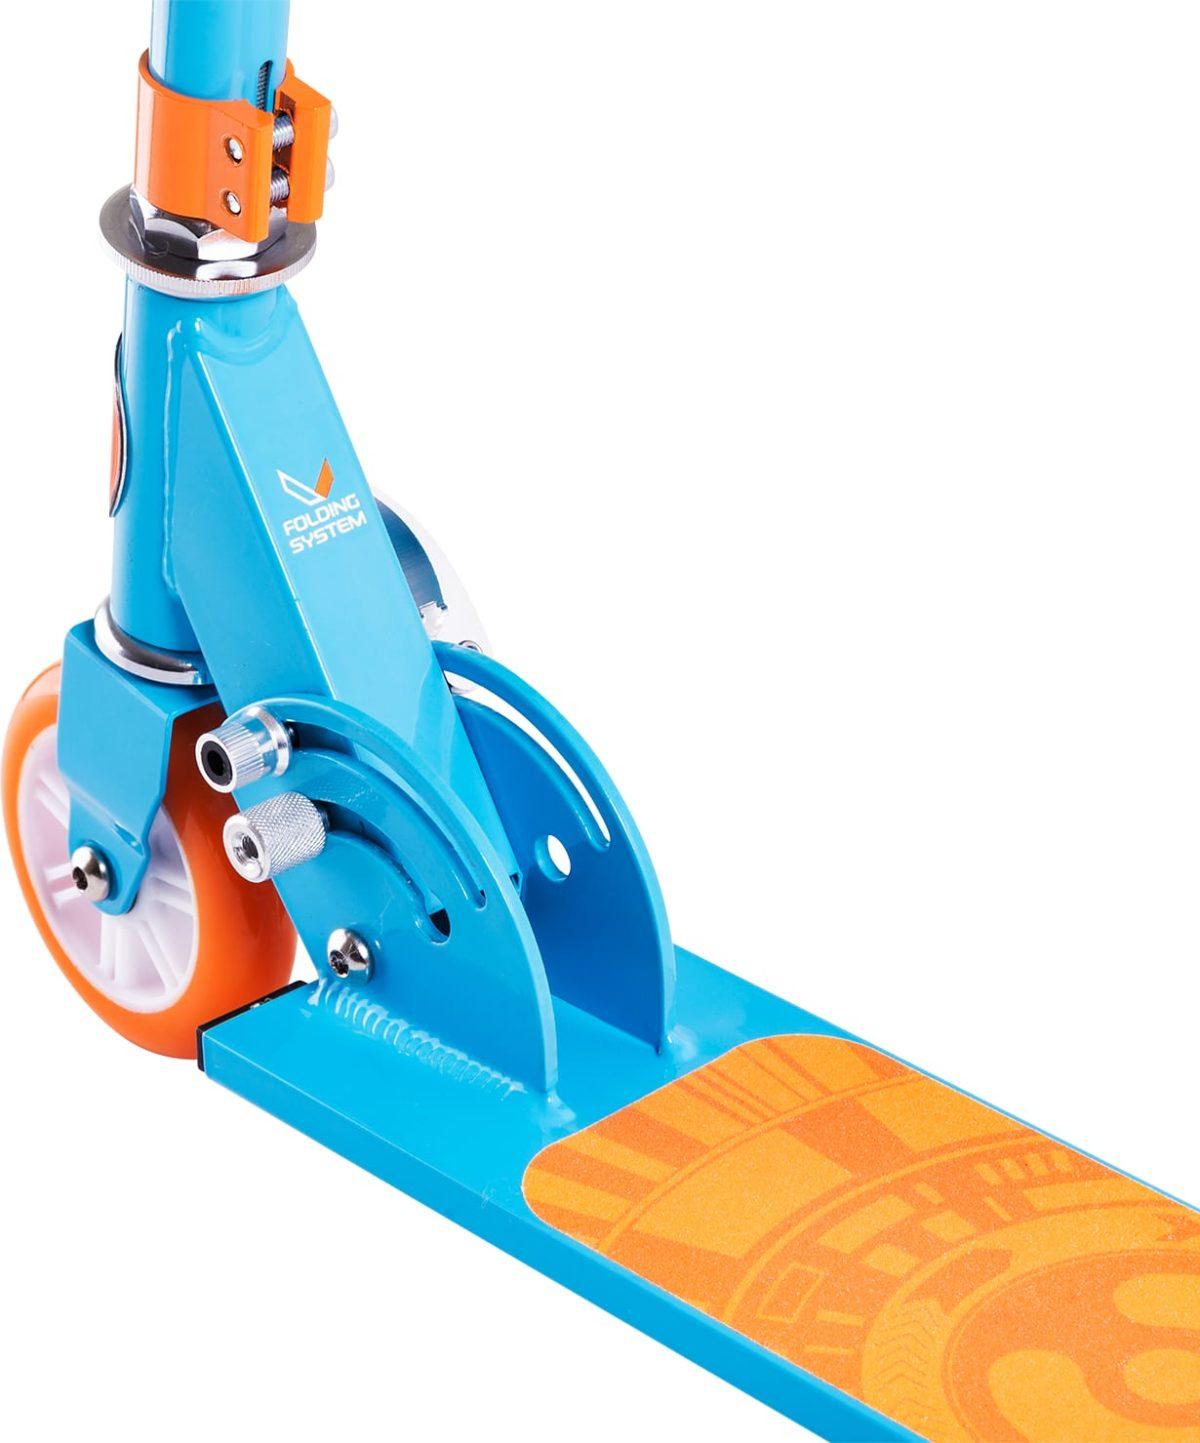 RIDEX Sonic Самокат 2-колесный  100 мм  Sonic: синий - 4